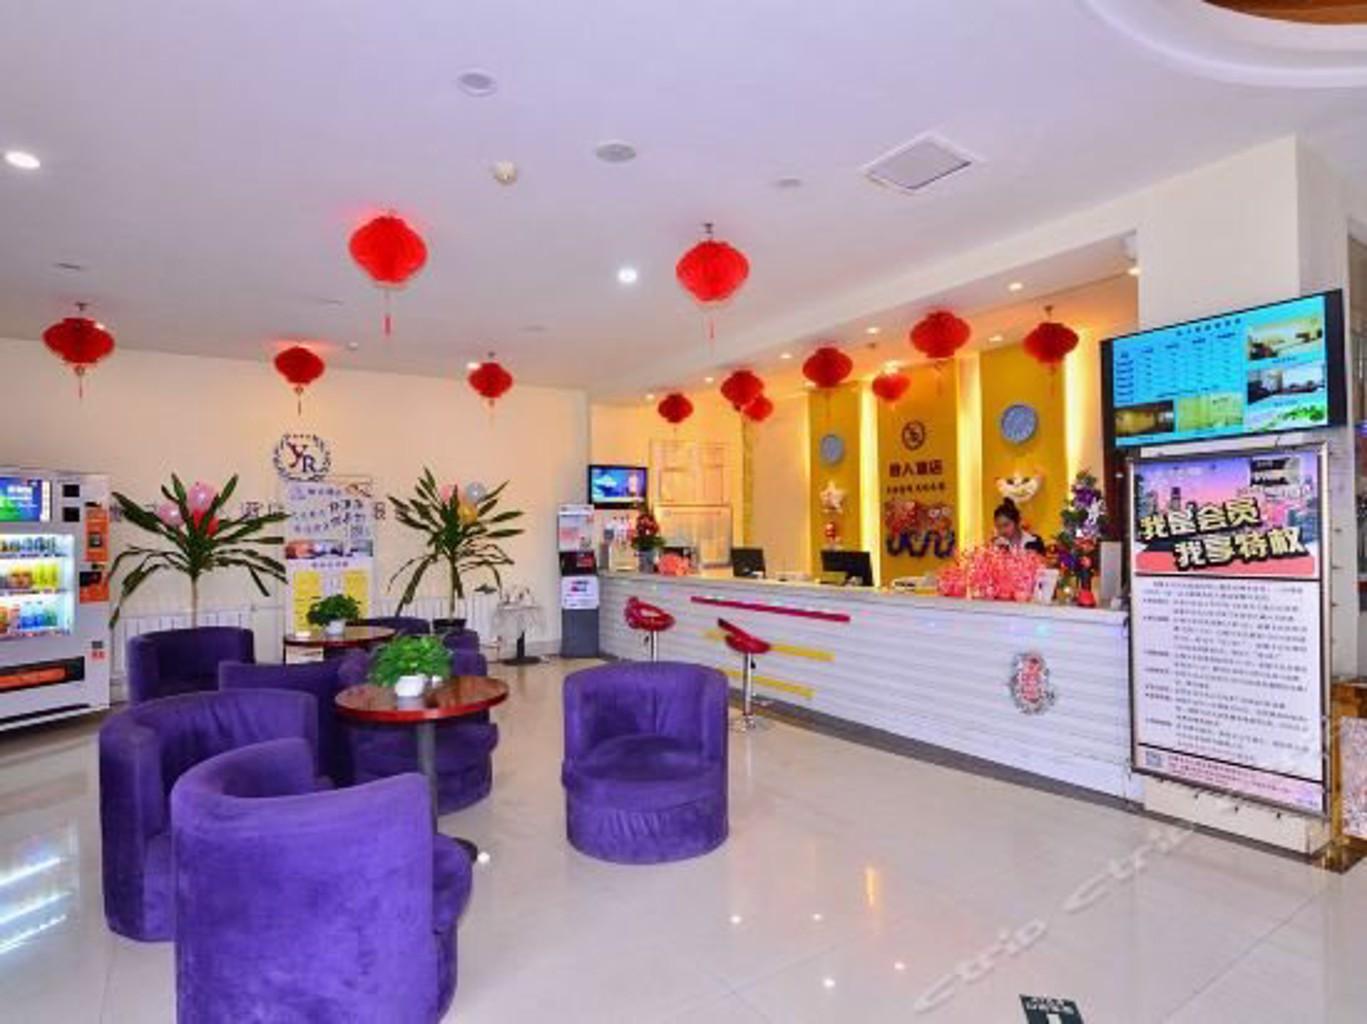 Gallery image of Yiren Hotel